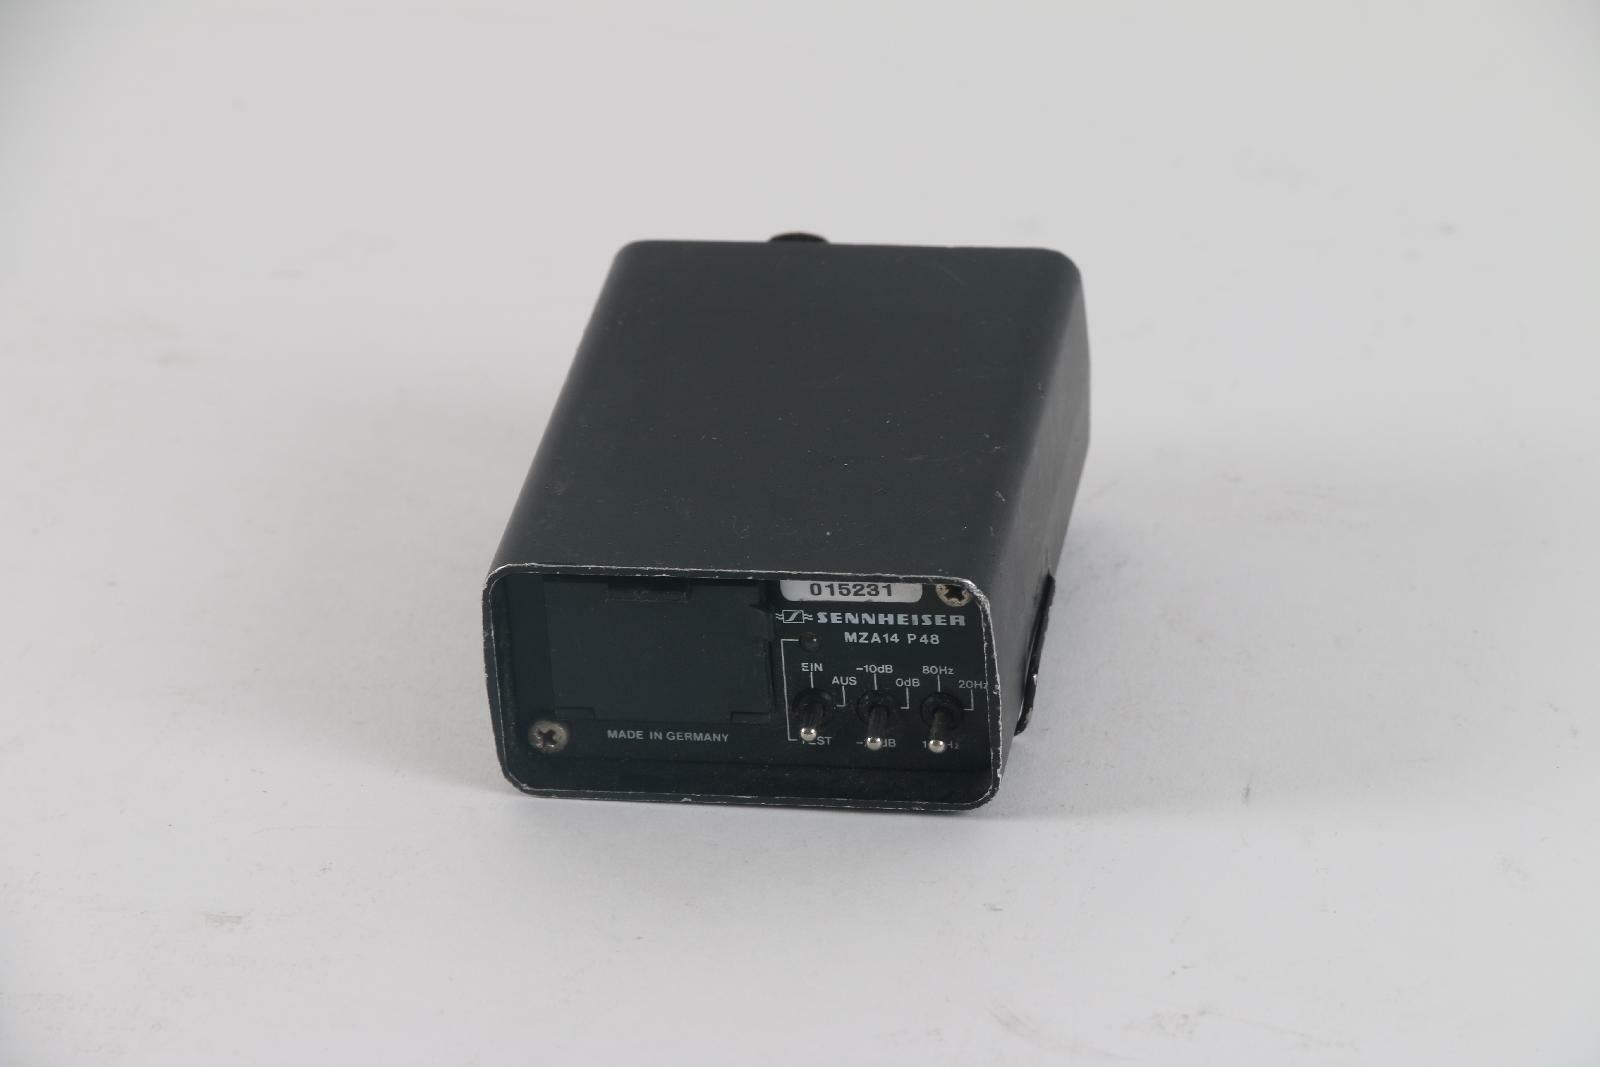 Sennheiser MZA14 P48 XLR Balance Power Supply Unit